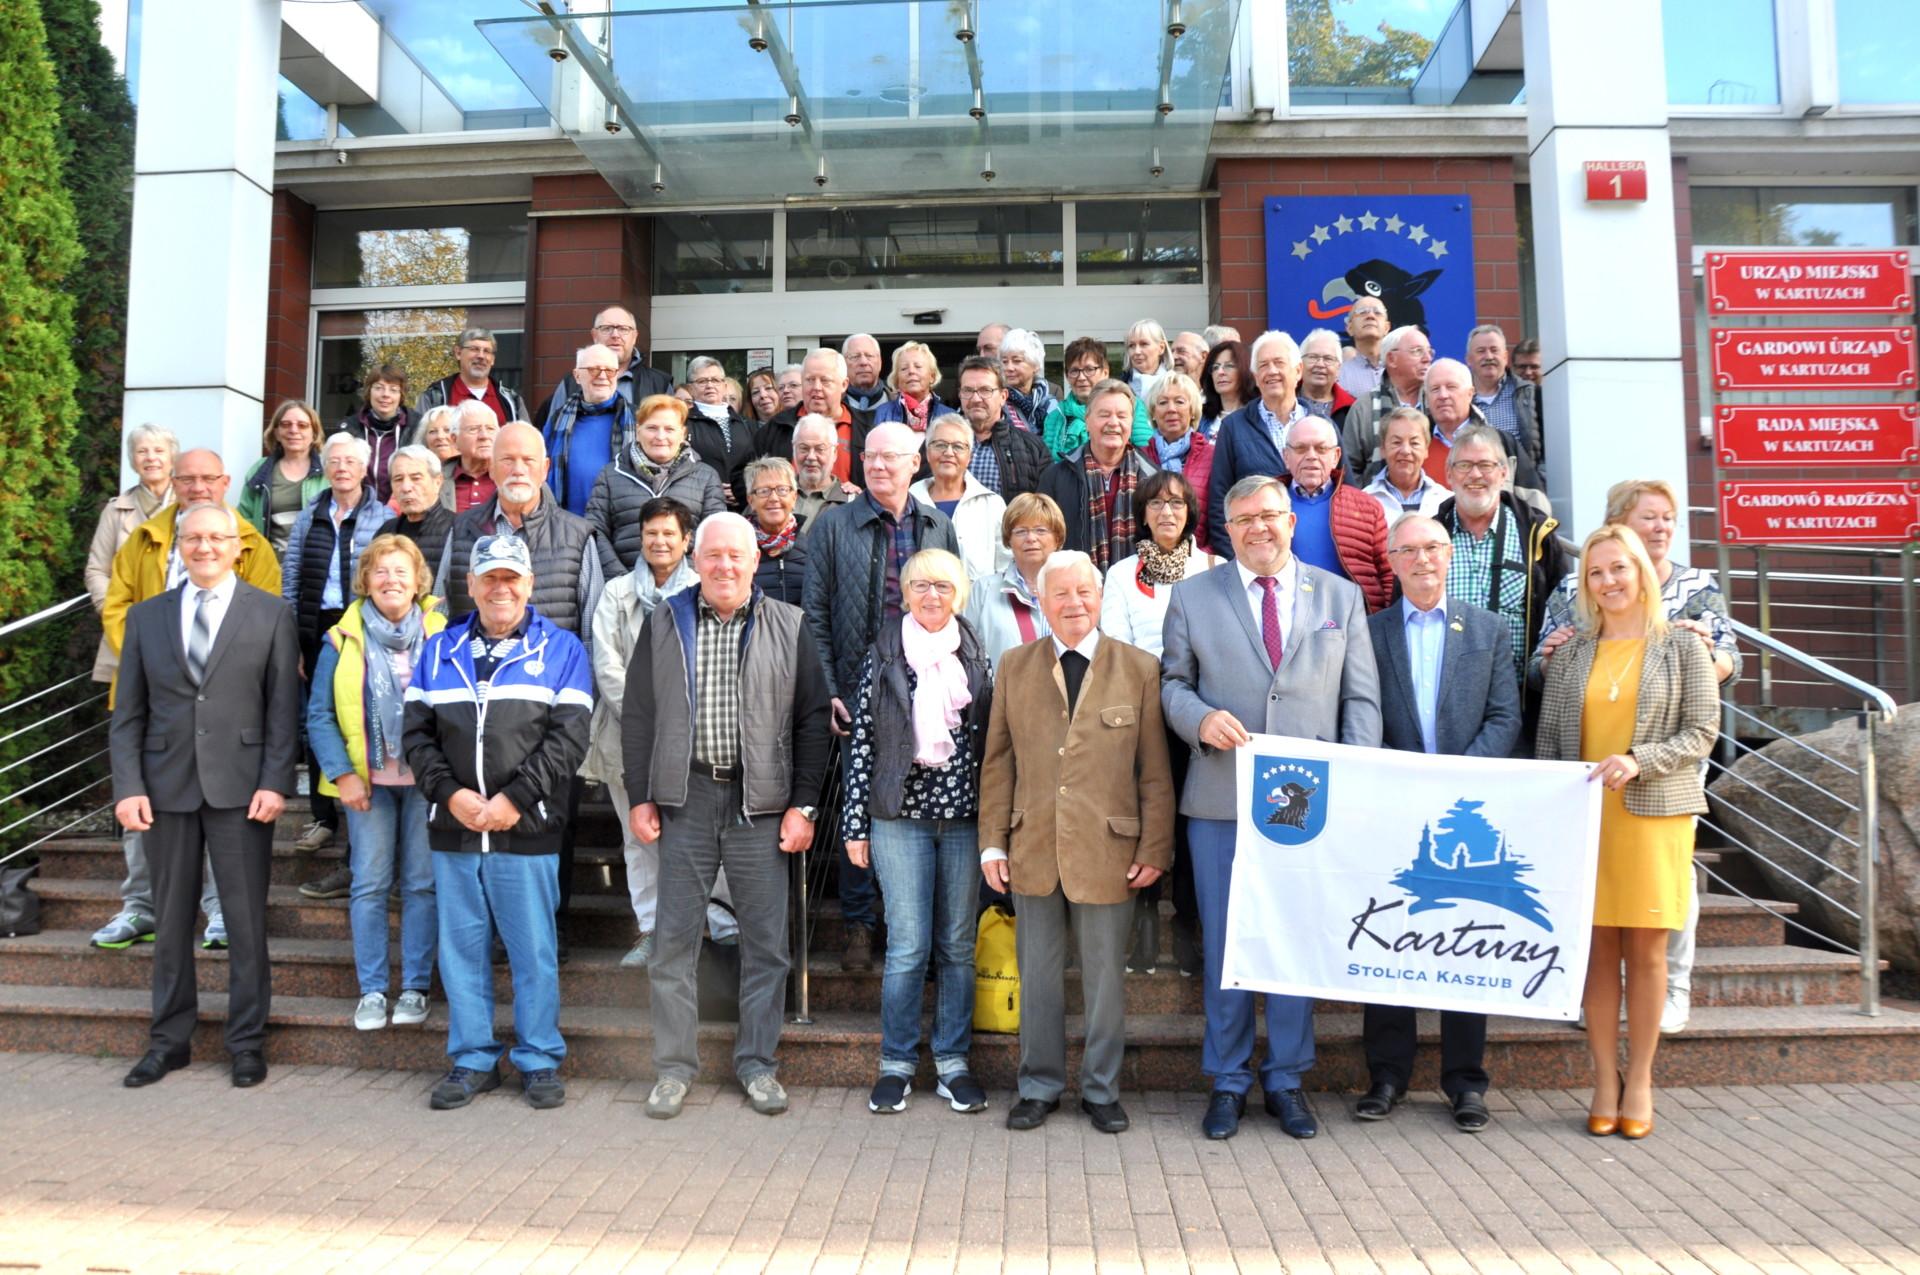 25-lecie partnerstwa gminy Kartuzy i miasta Duderstadt 4